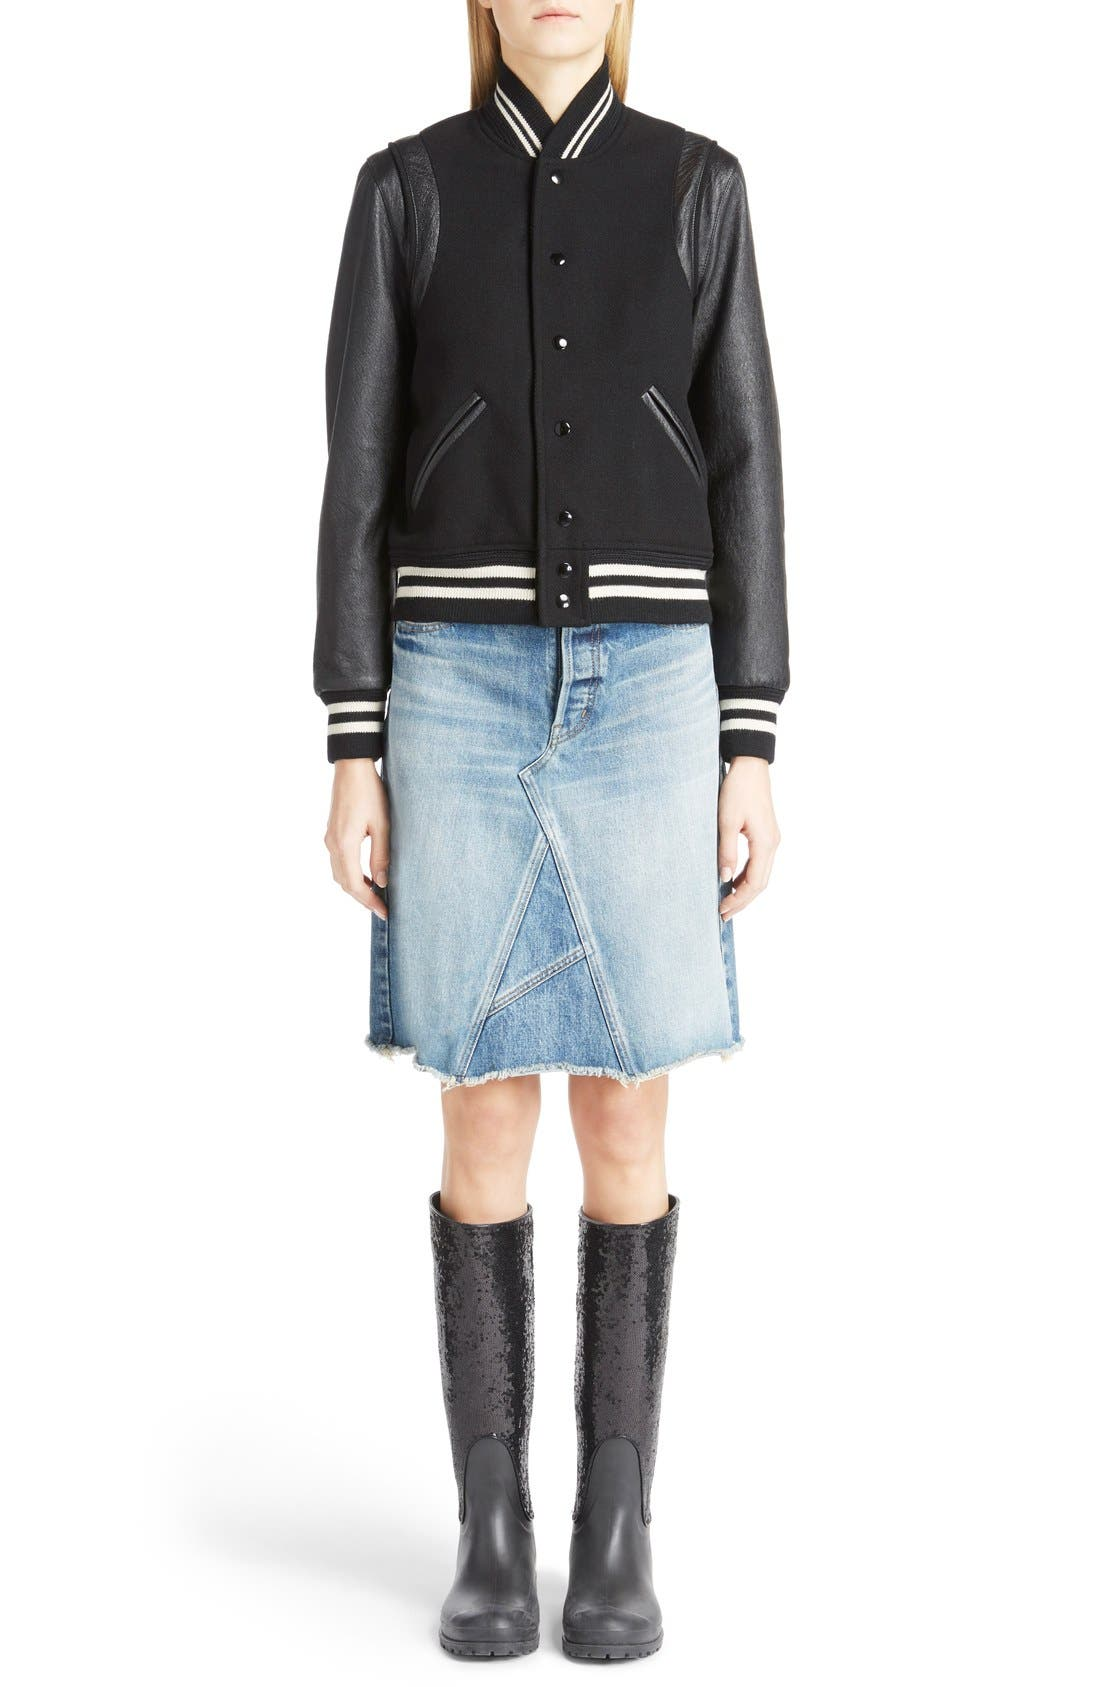 Alternate Image 1 Selected - Saint Laurent 'Teddy' Full Leather Sleeve Bomber Jacket